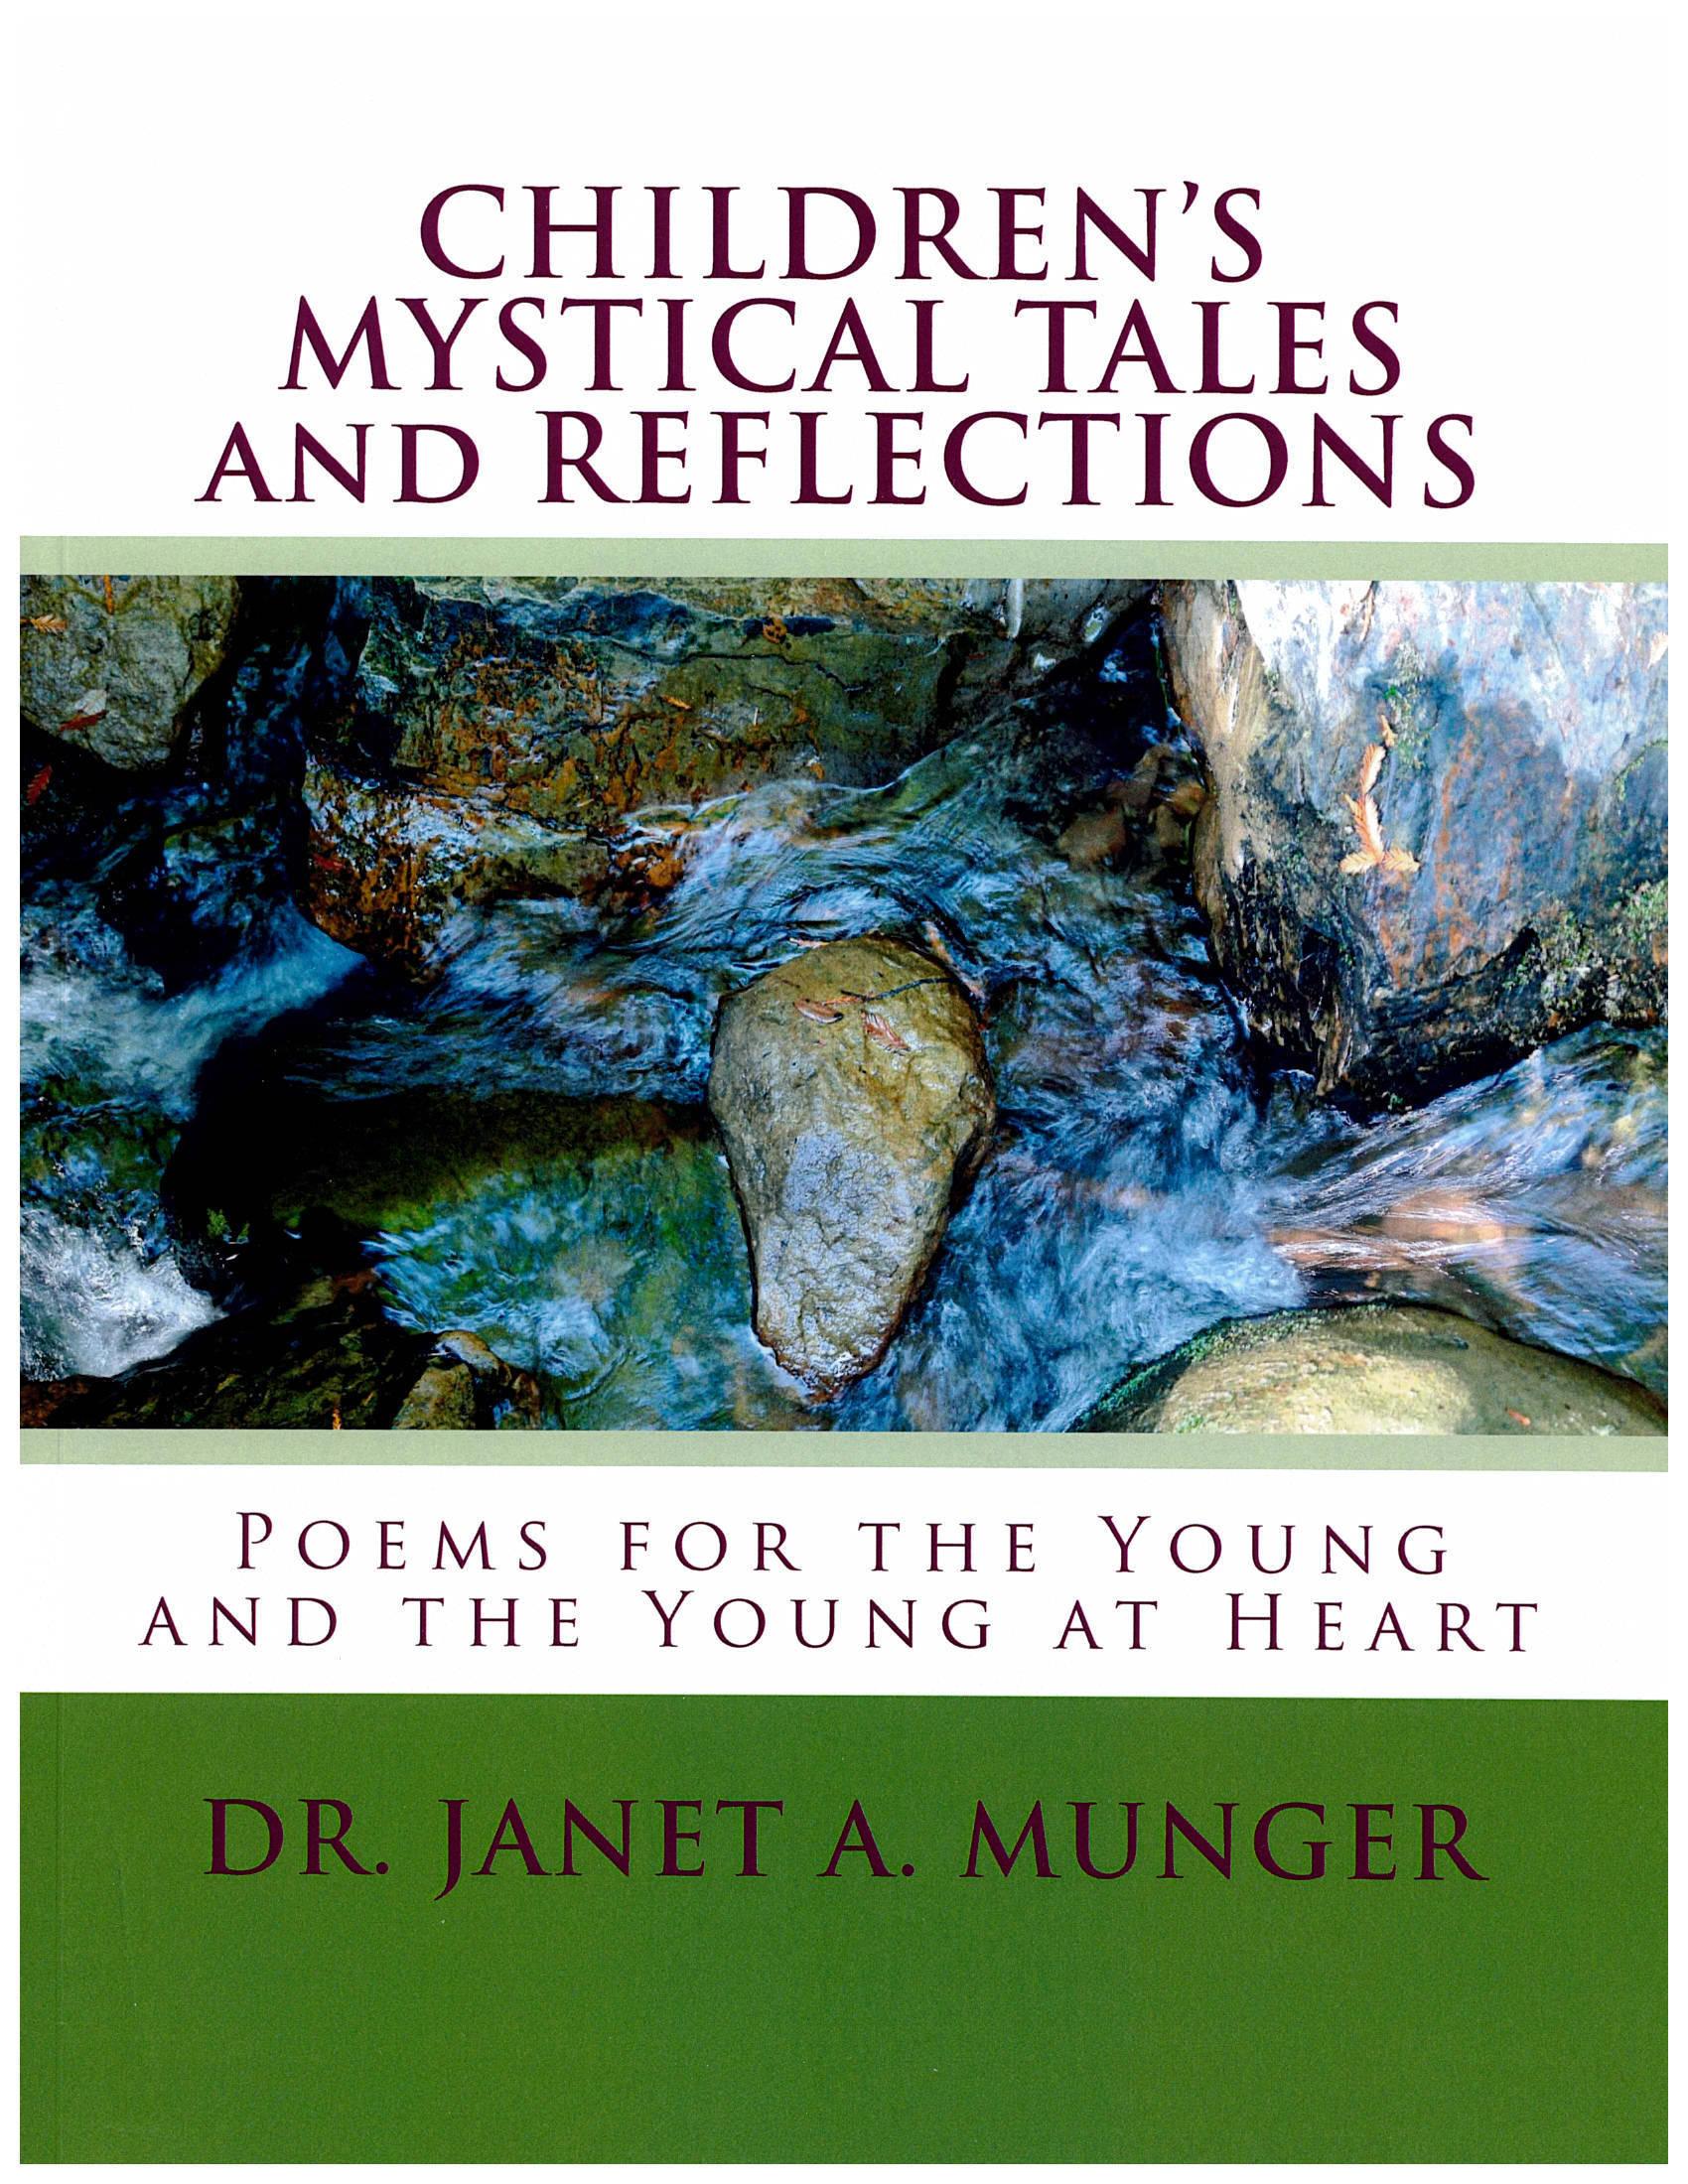 2b68e8ba412f77891bf8_Facebook_JPG_Children_s_Mystical_Tales_Cover.jpg